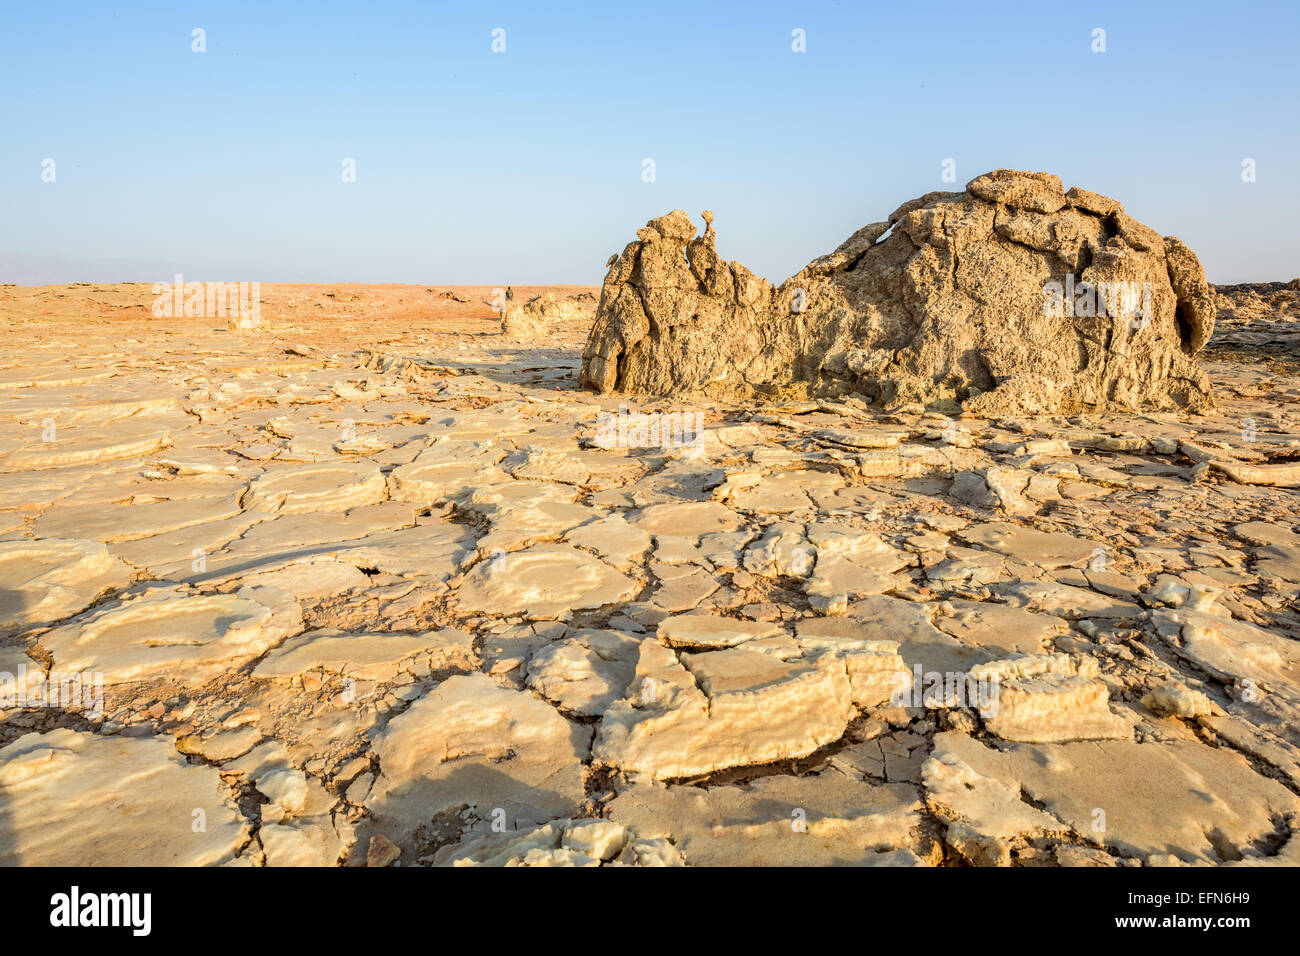 Desert near Dallol in Ethiopia - Stock Image